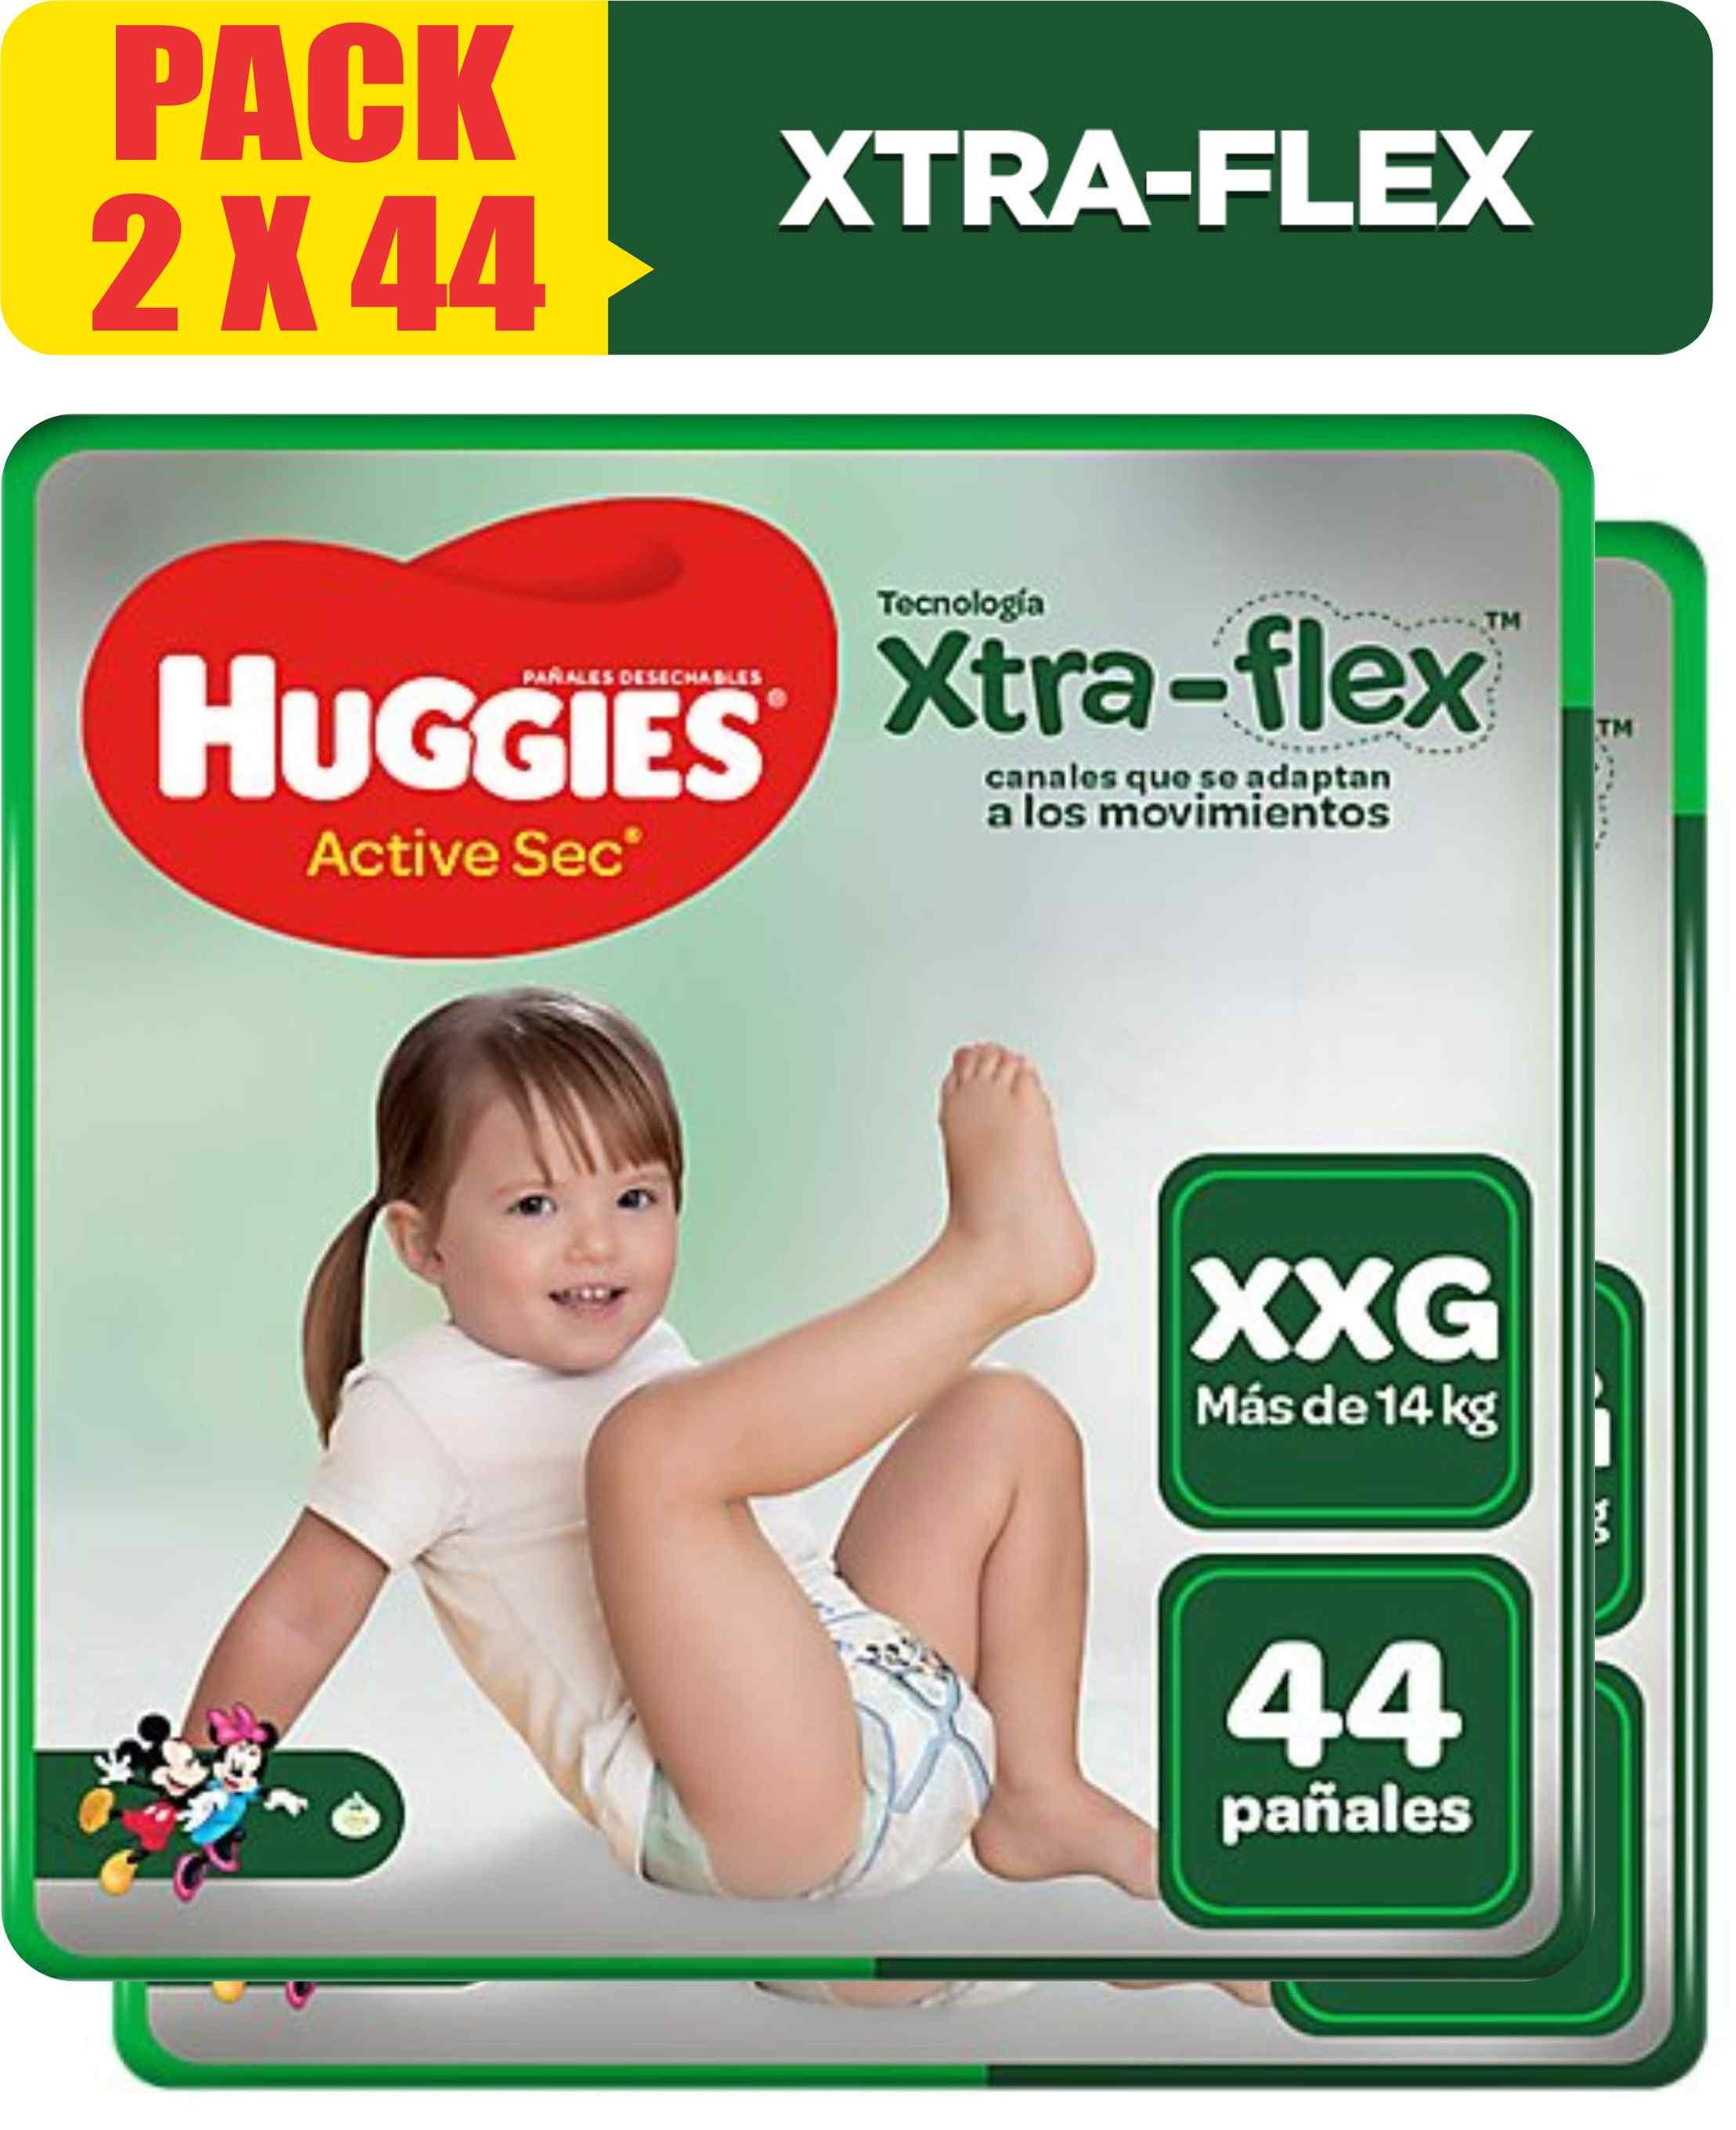 Pañales Huggies Active Sec Xtra Flex Talla XXG - Pack x 2 bolsas 44 unidades